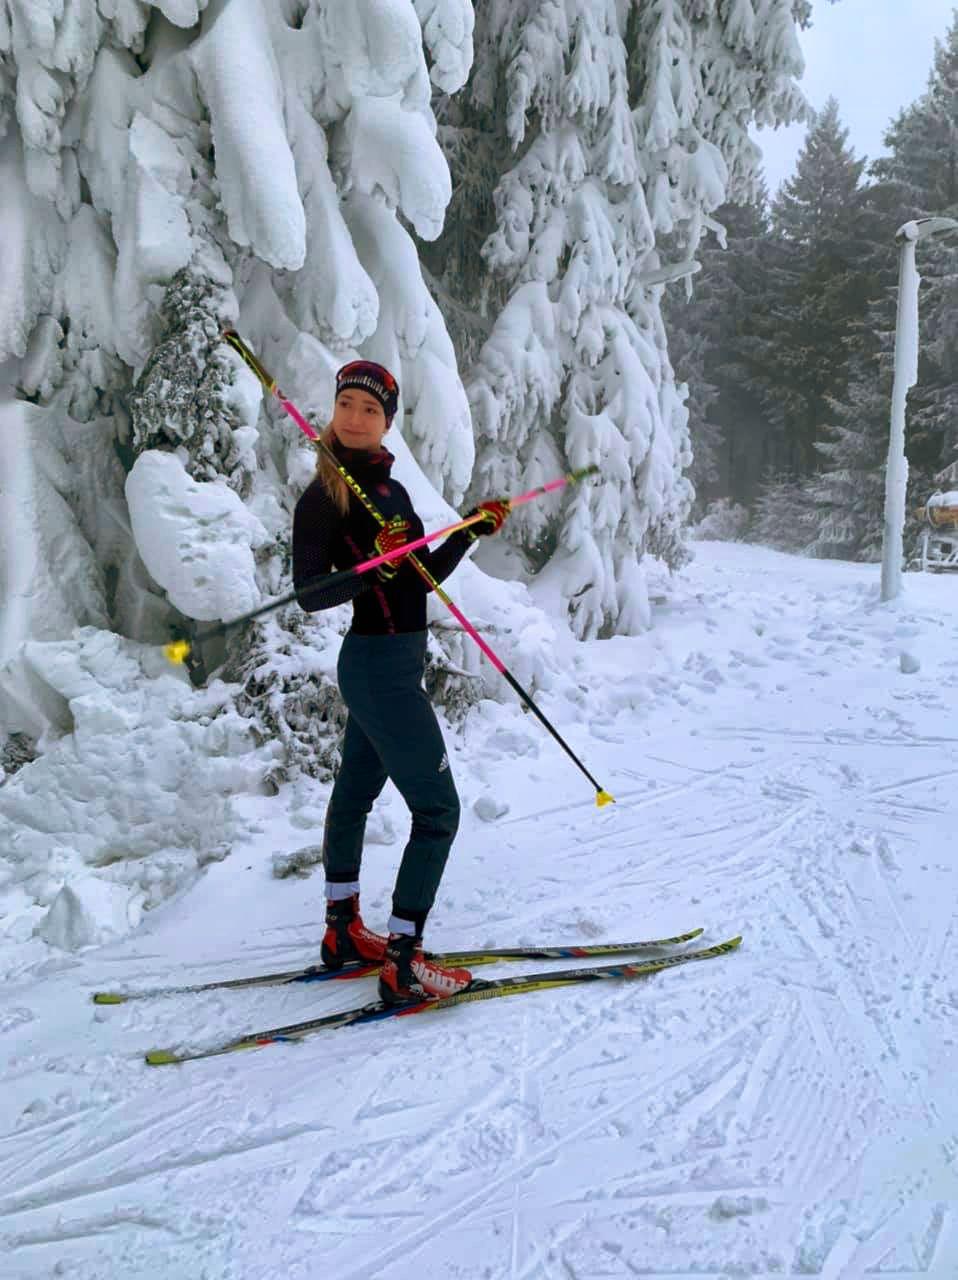 Biathletin Nathalie Aspasia Horstmann